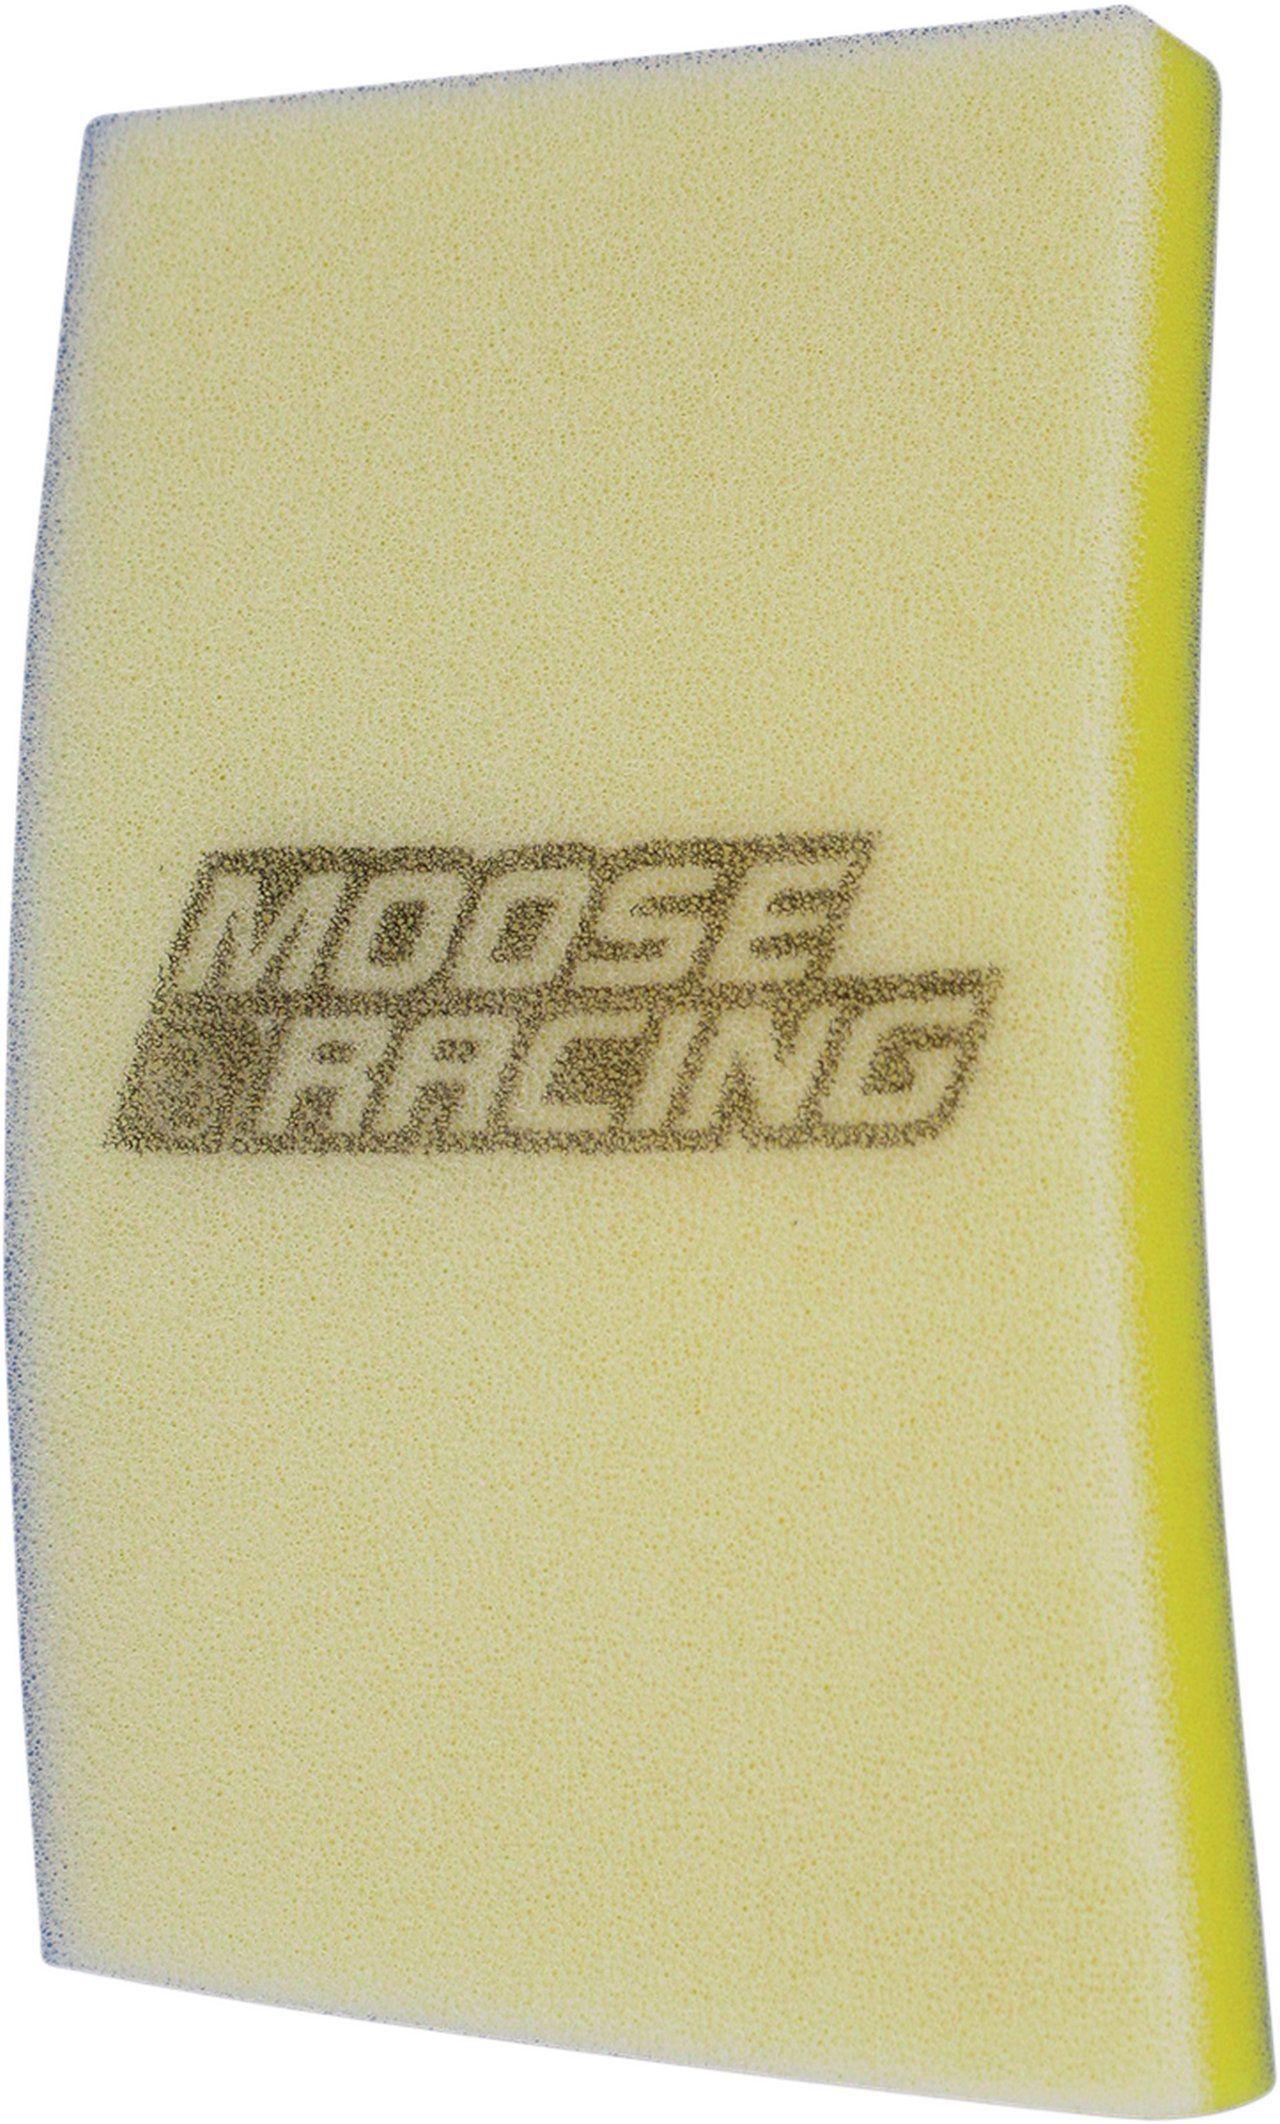 【MOOSE RACING】PPO (PRECISION PRE-OILED) 空氣濾芯 [M763-80-10] - 「Webike-摩托百貨」